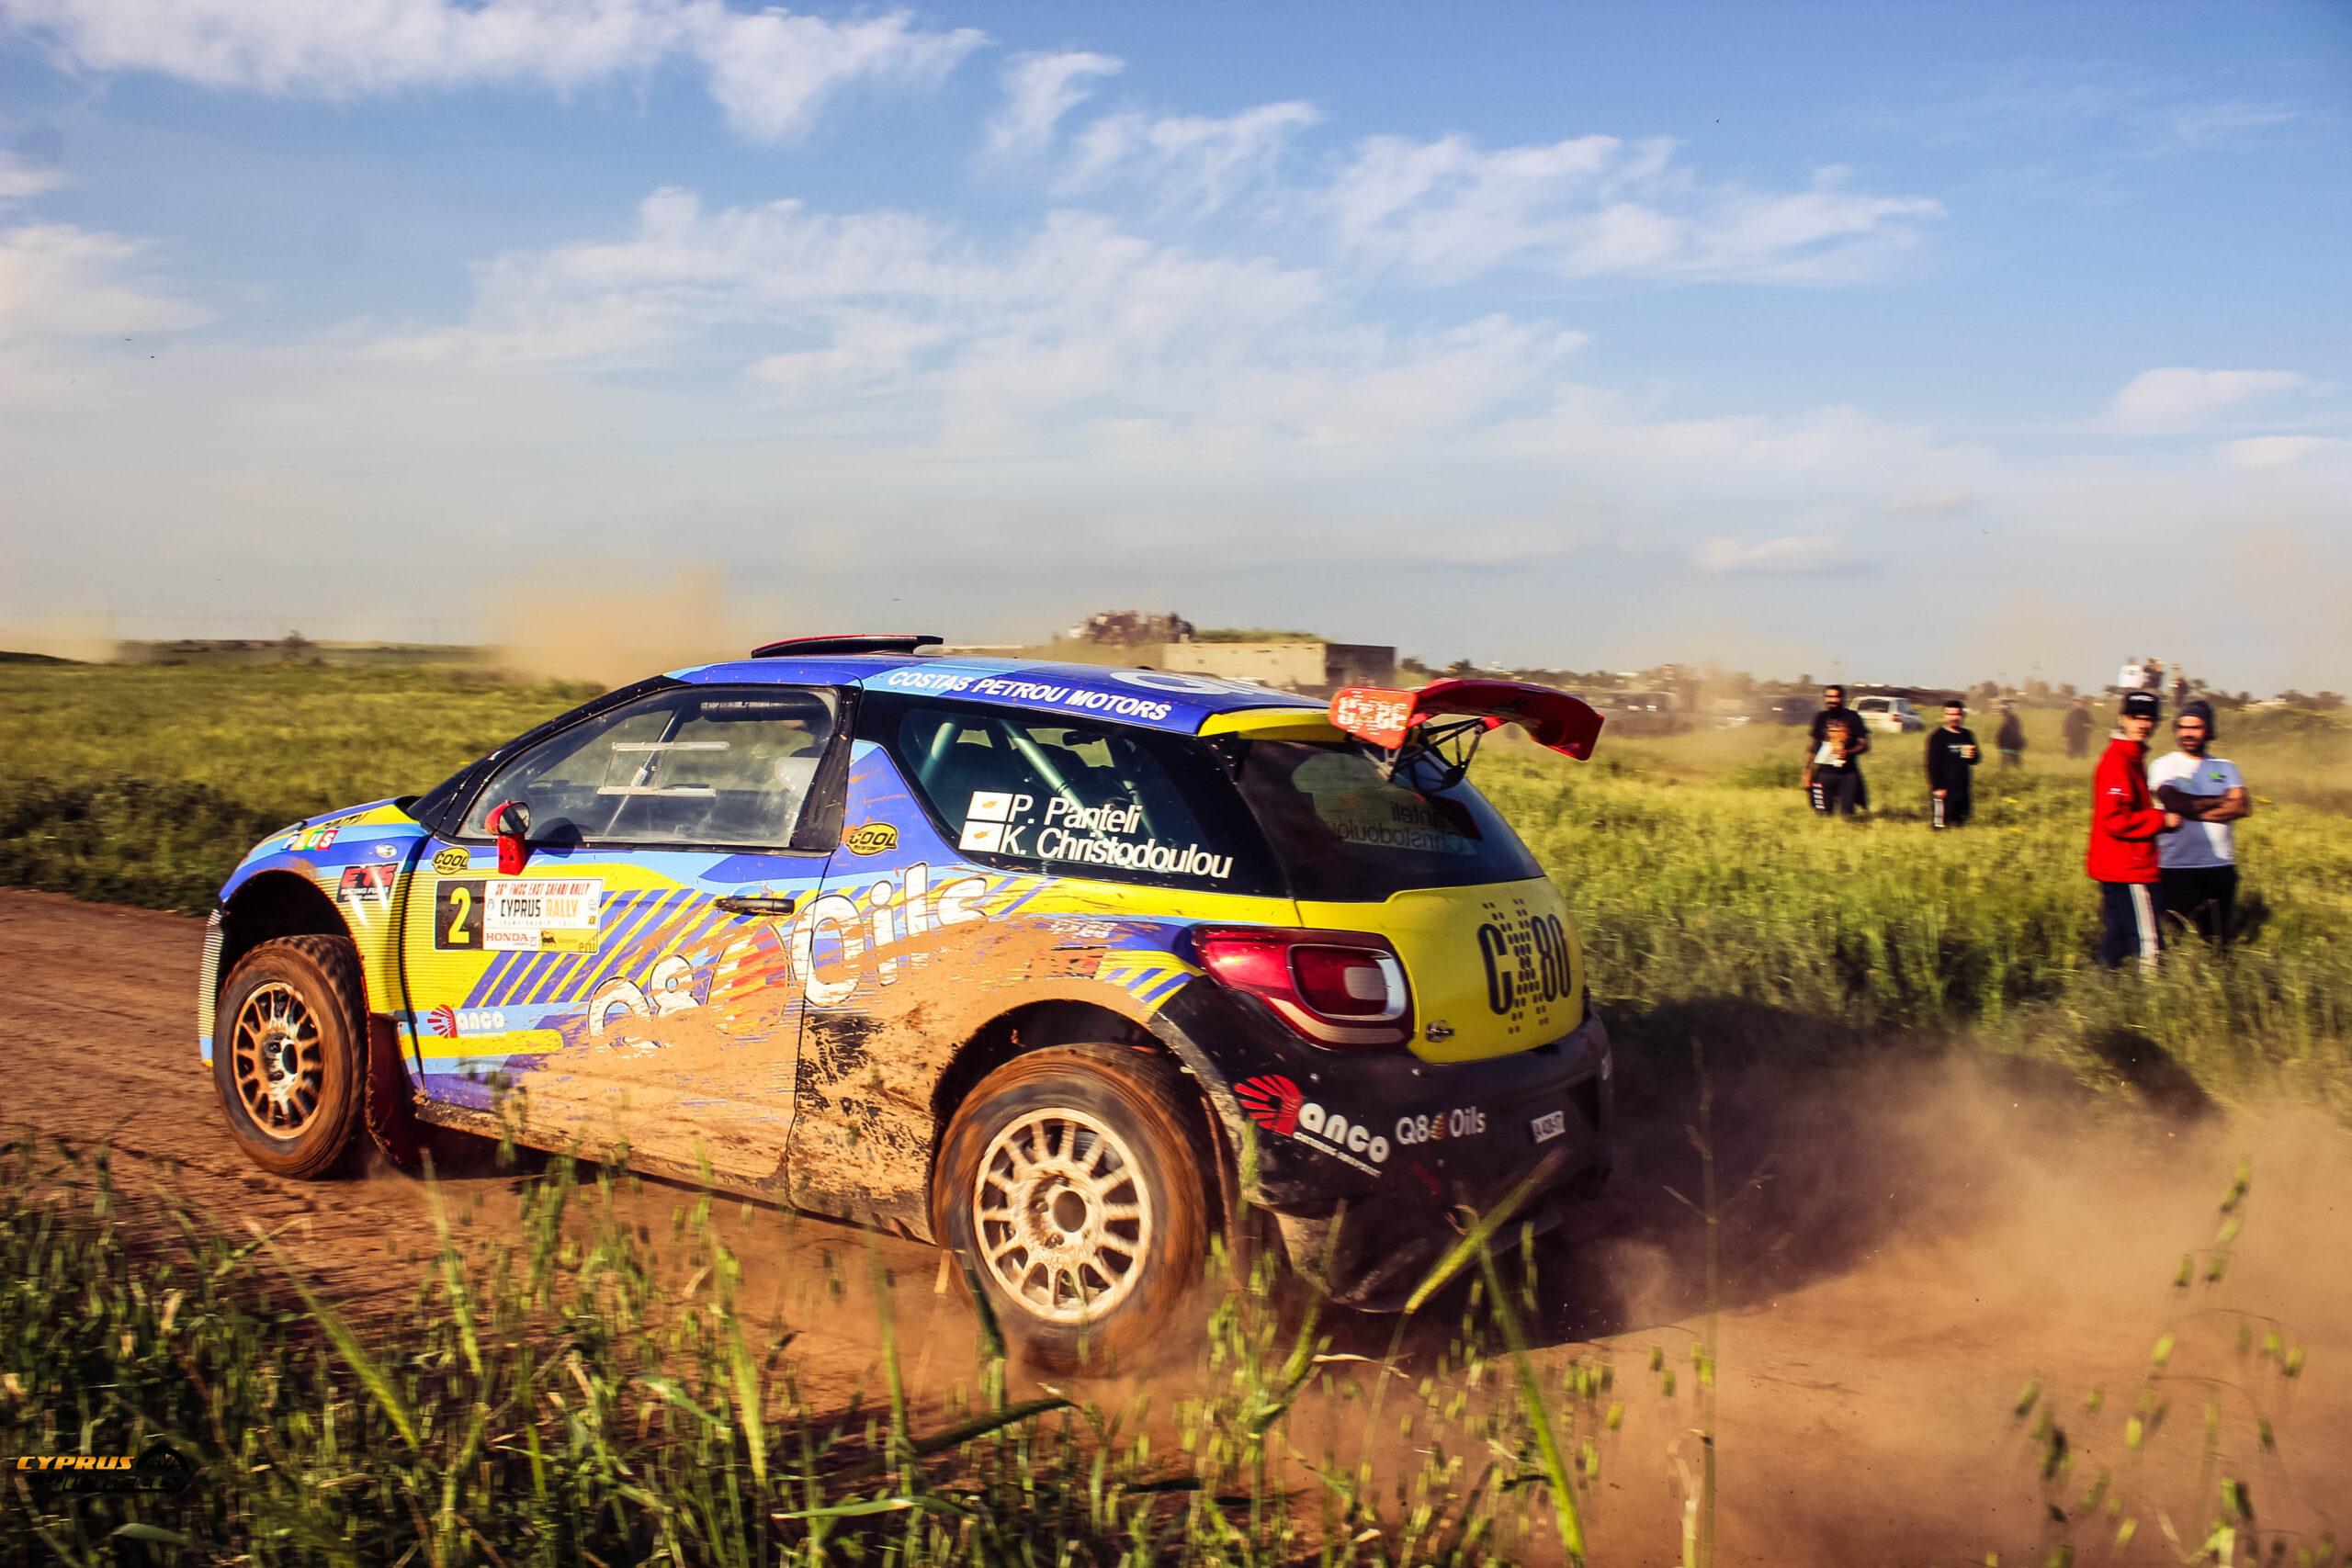 DS3 rally car cyprus